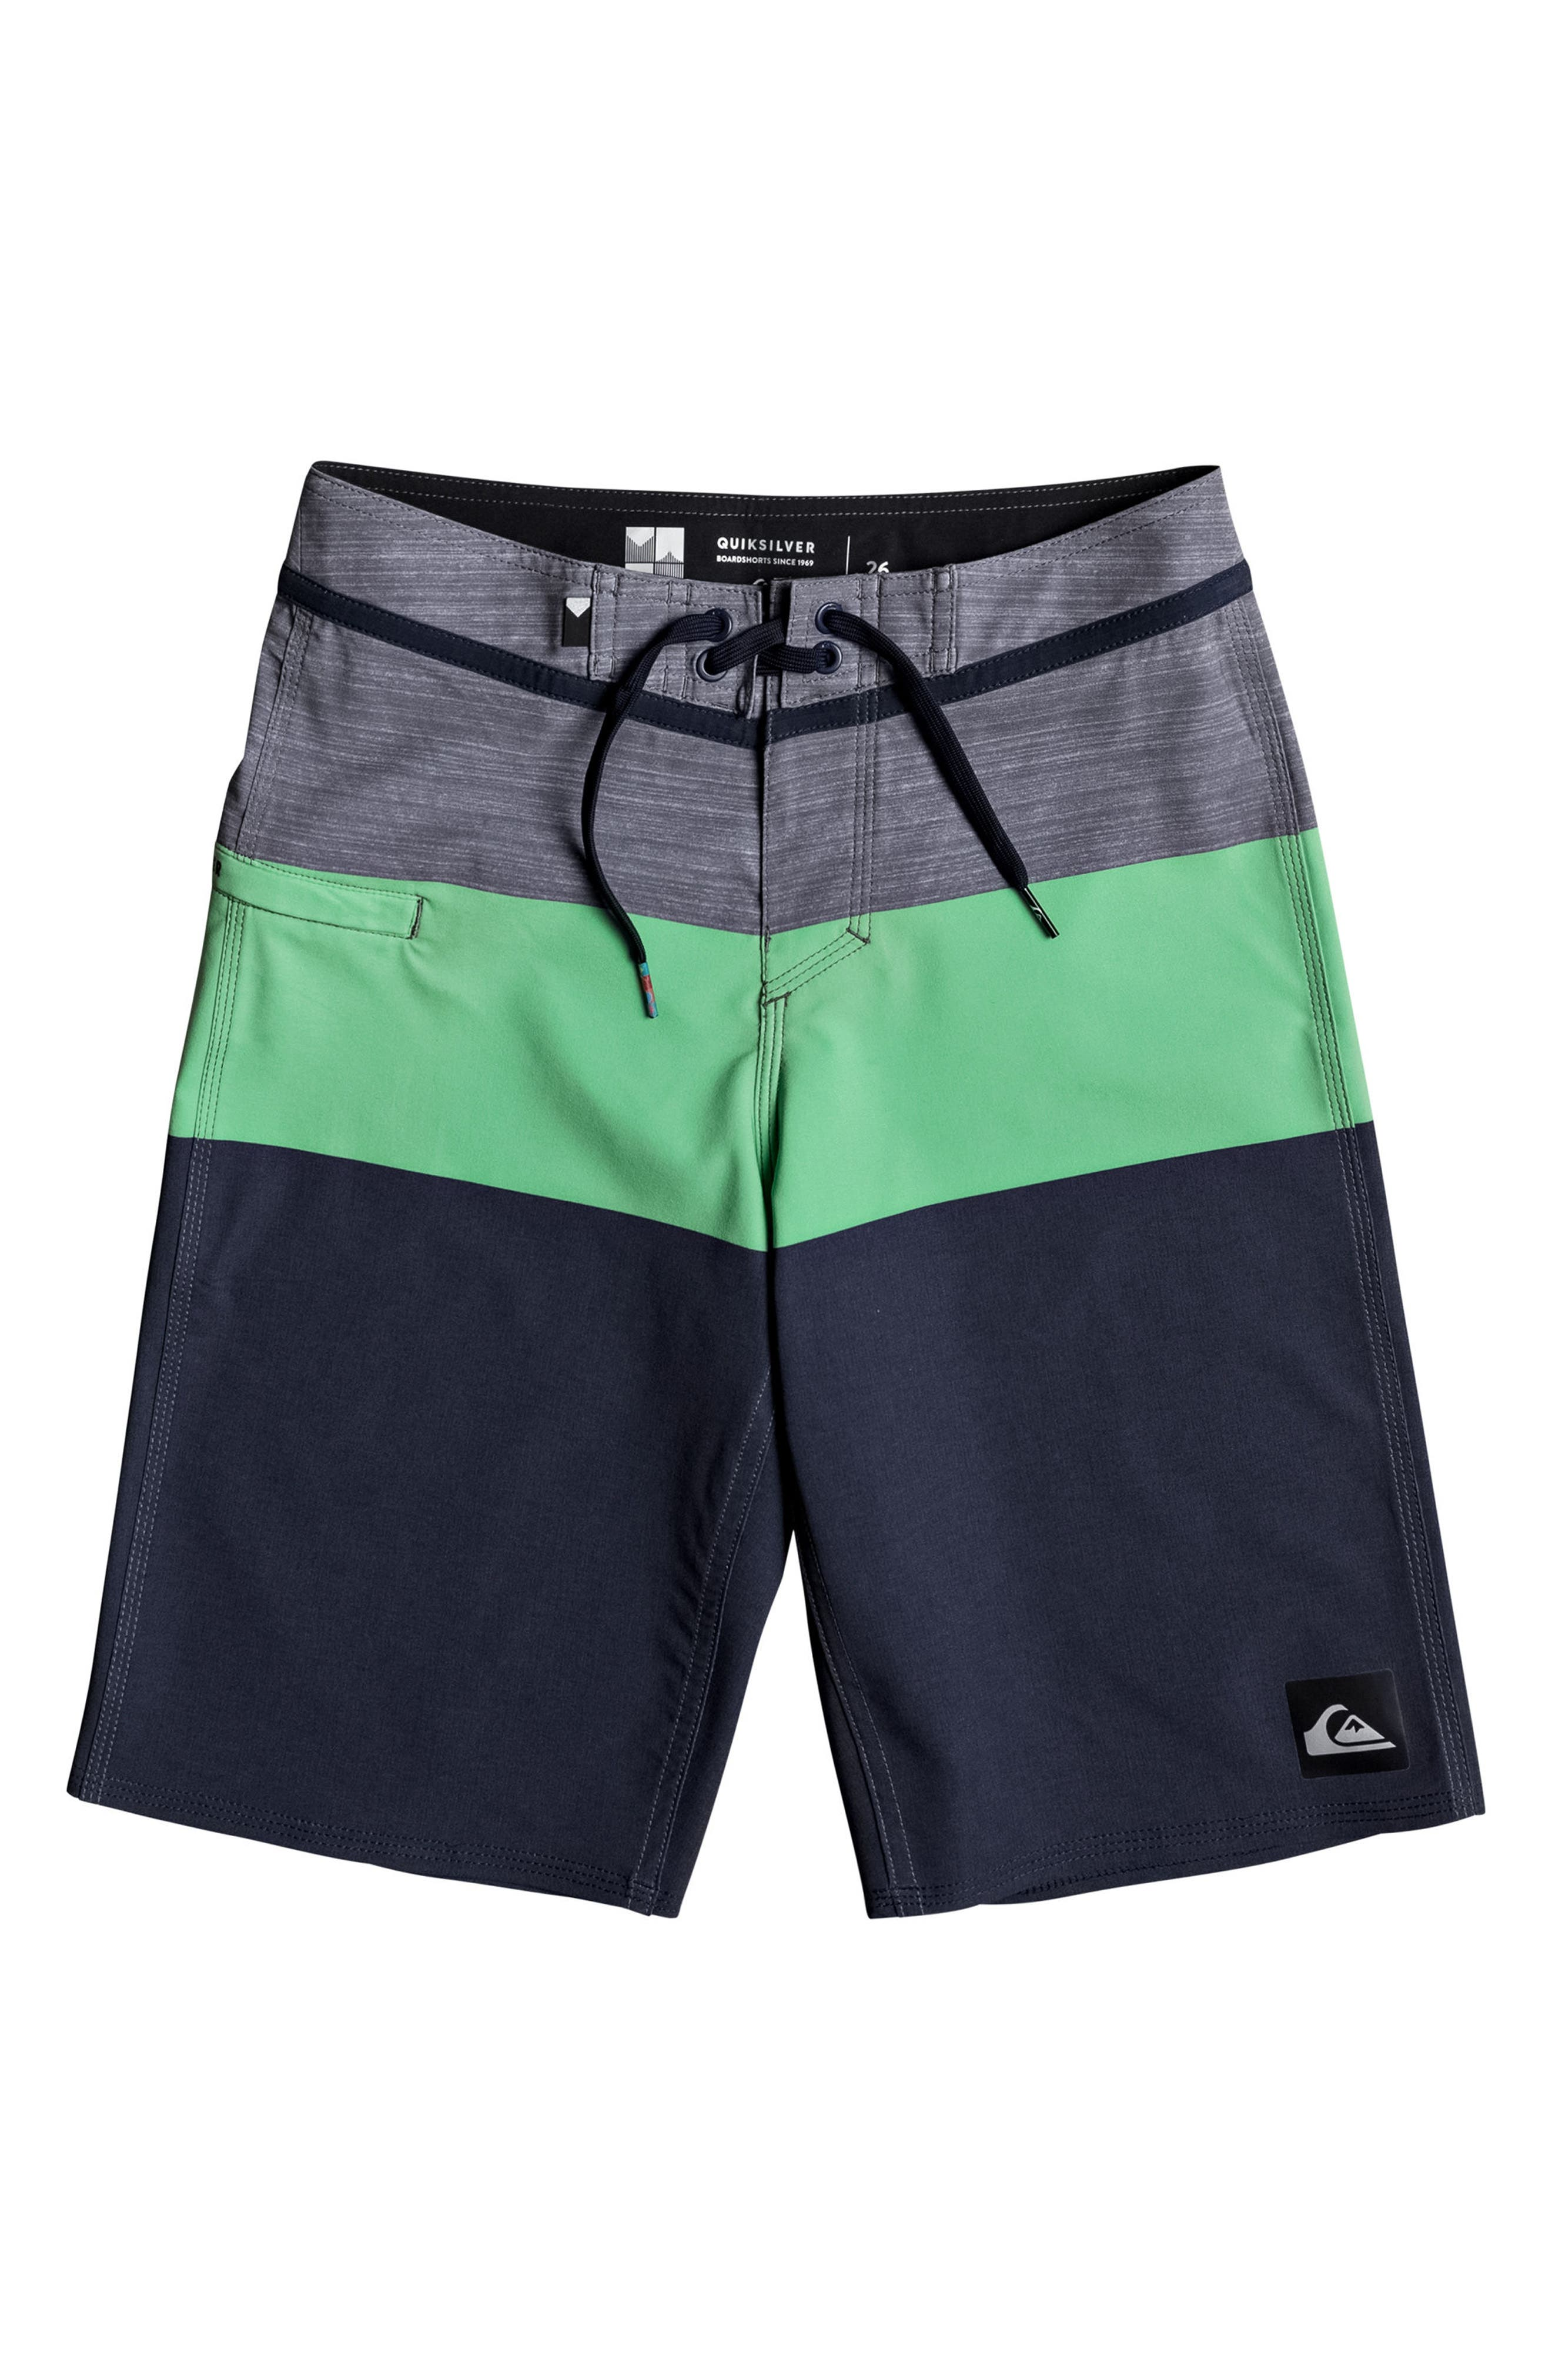 Main Image - Quiksilver Everyday Blocked Vee Board Shorts (Big Boys)